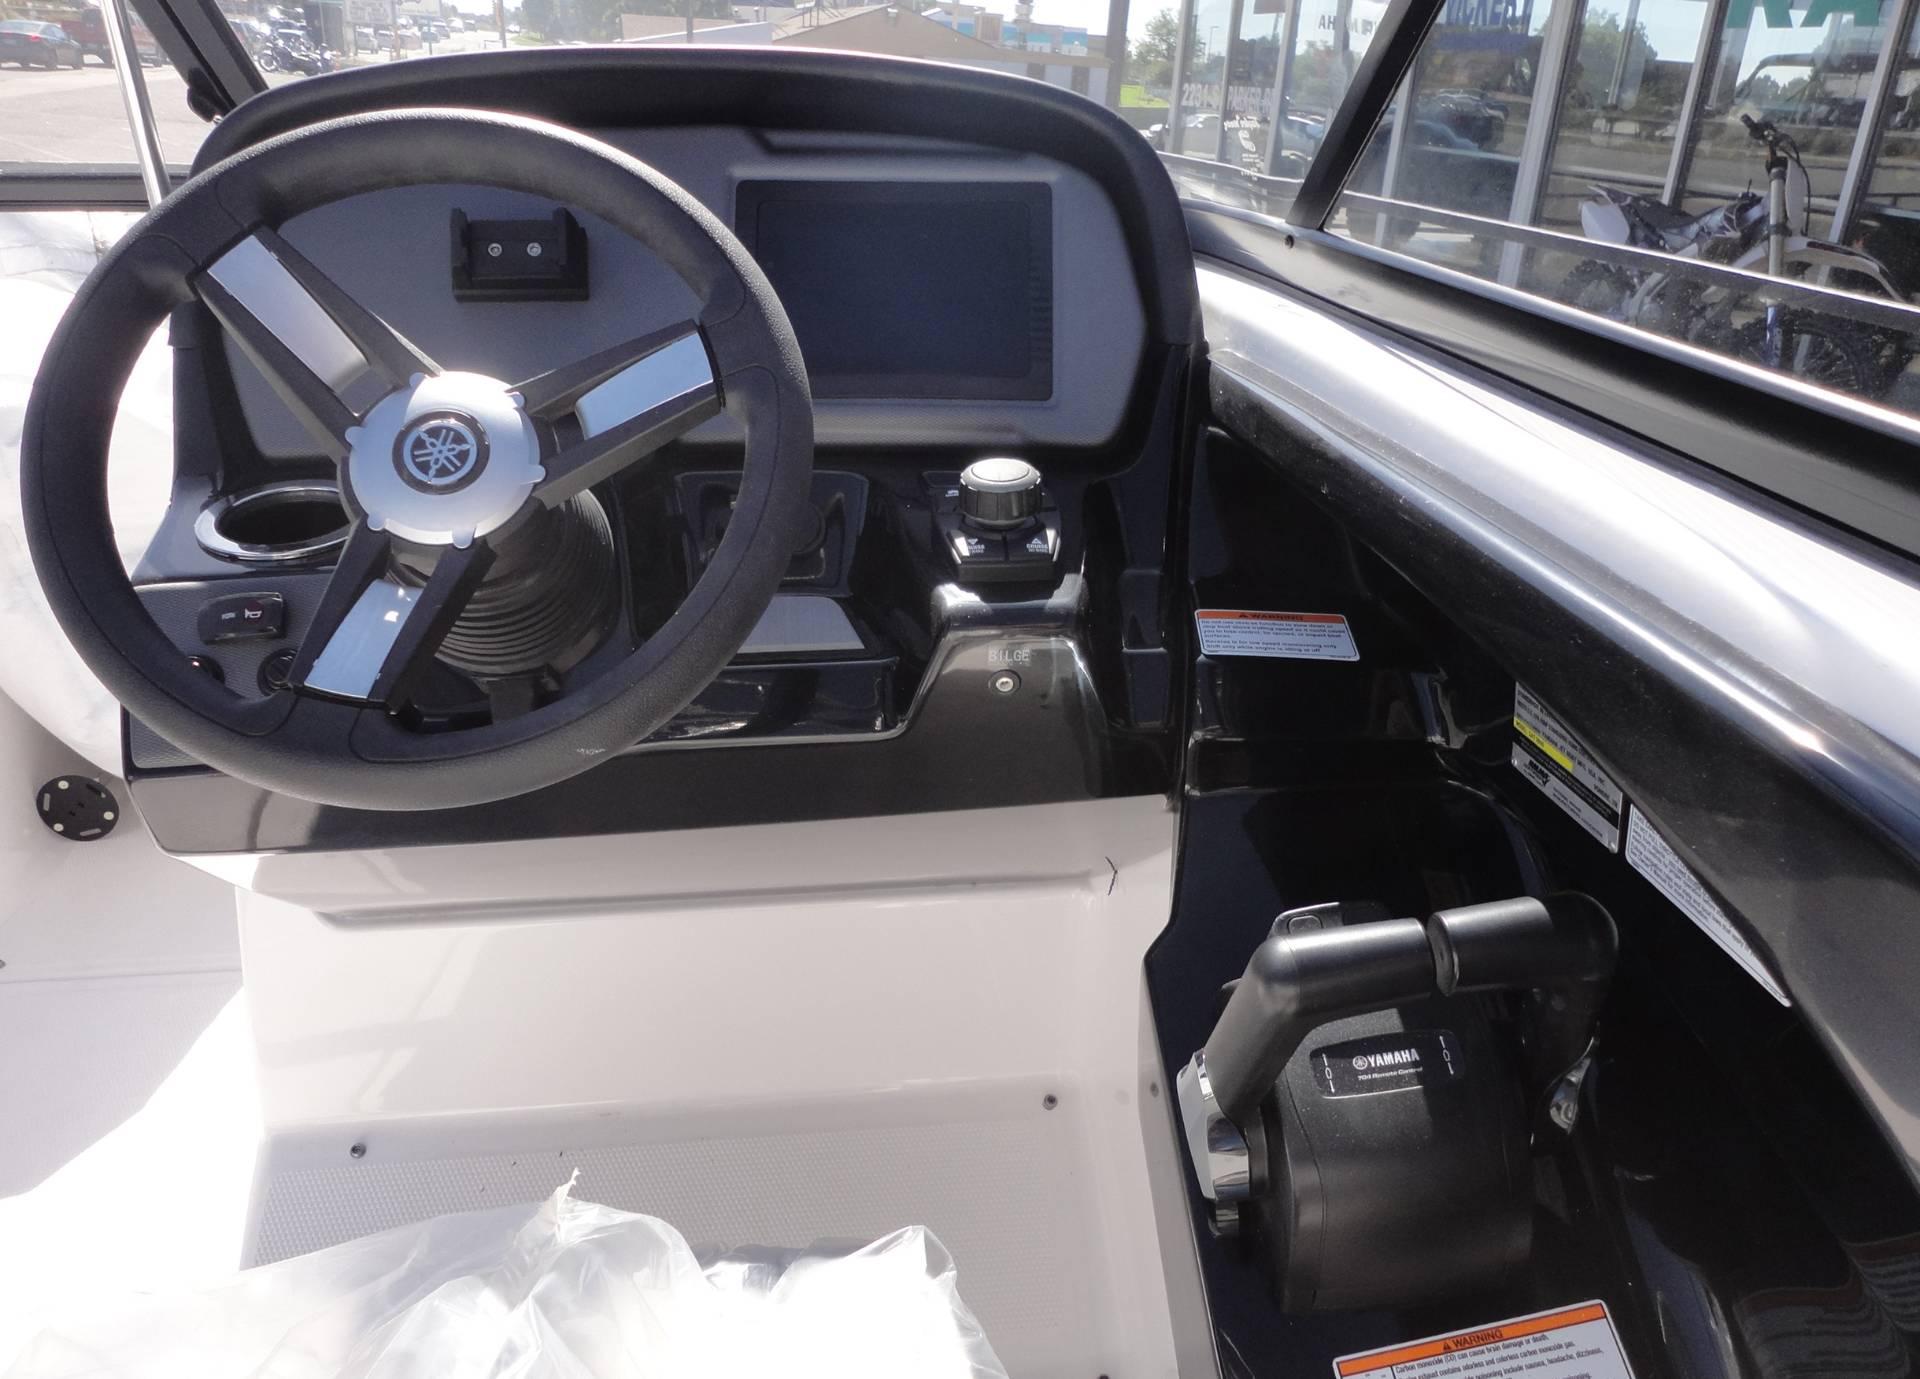 Interior Ar240